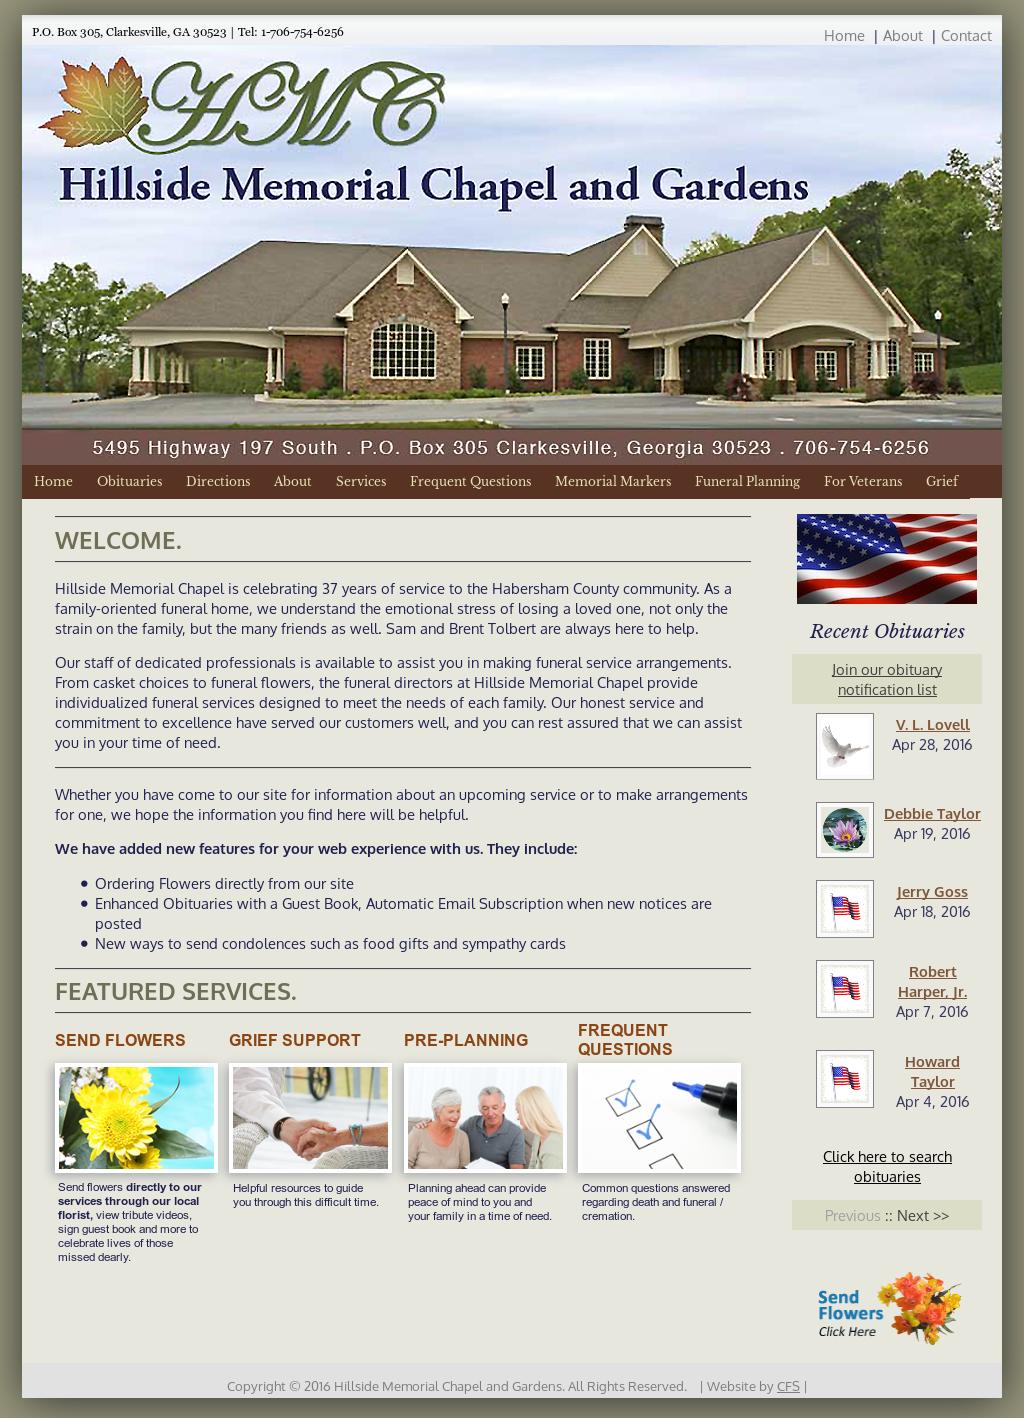 Hillside Memorial Chapel Competitors, Revenue and Employees